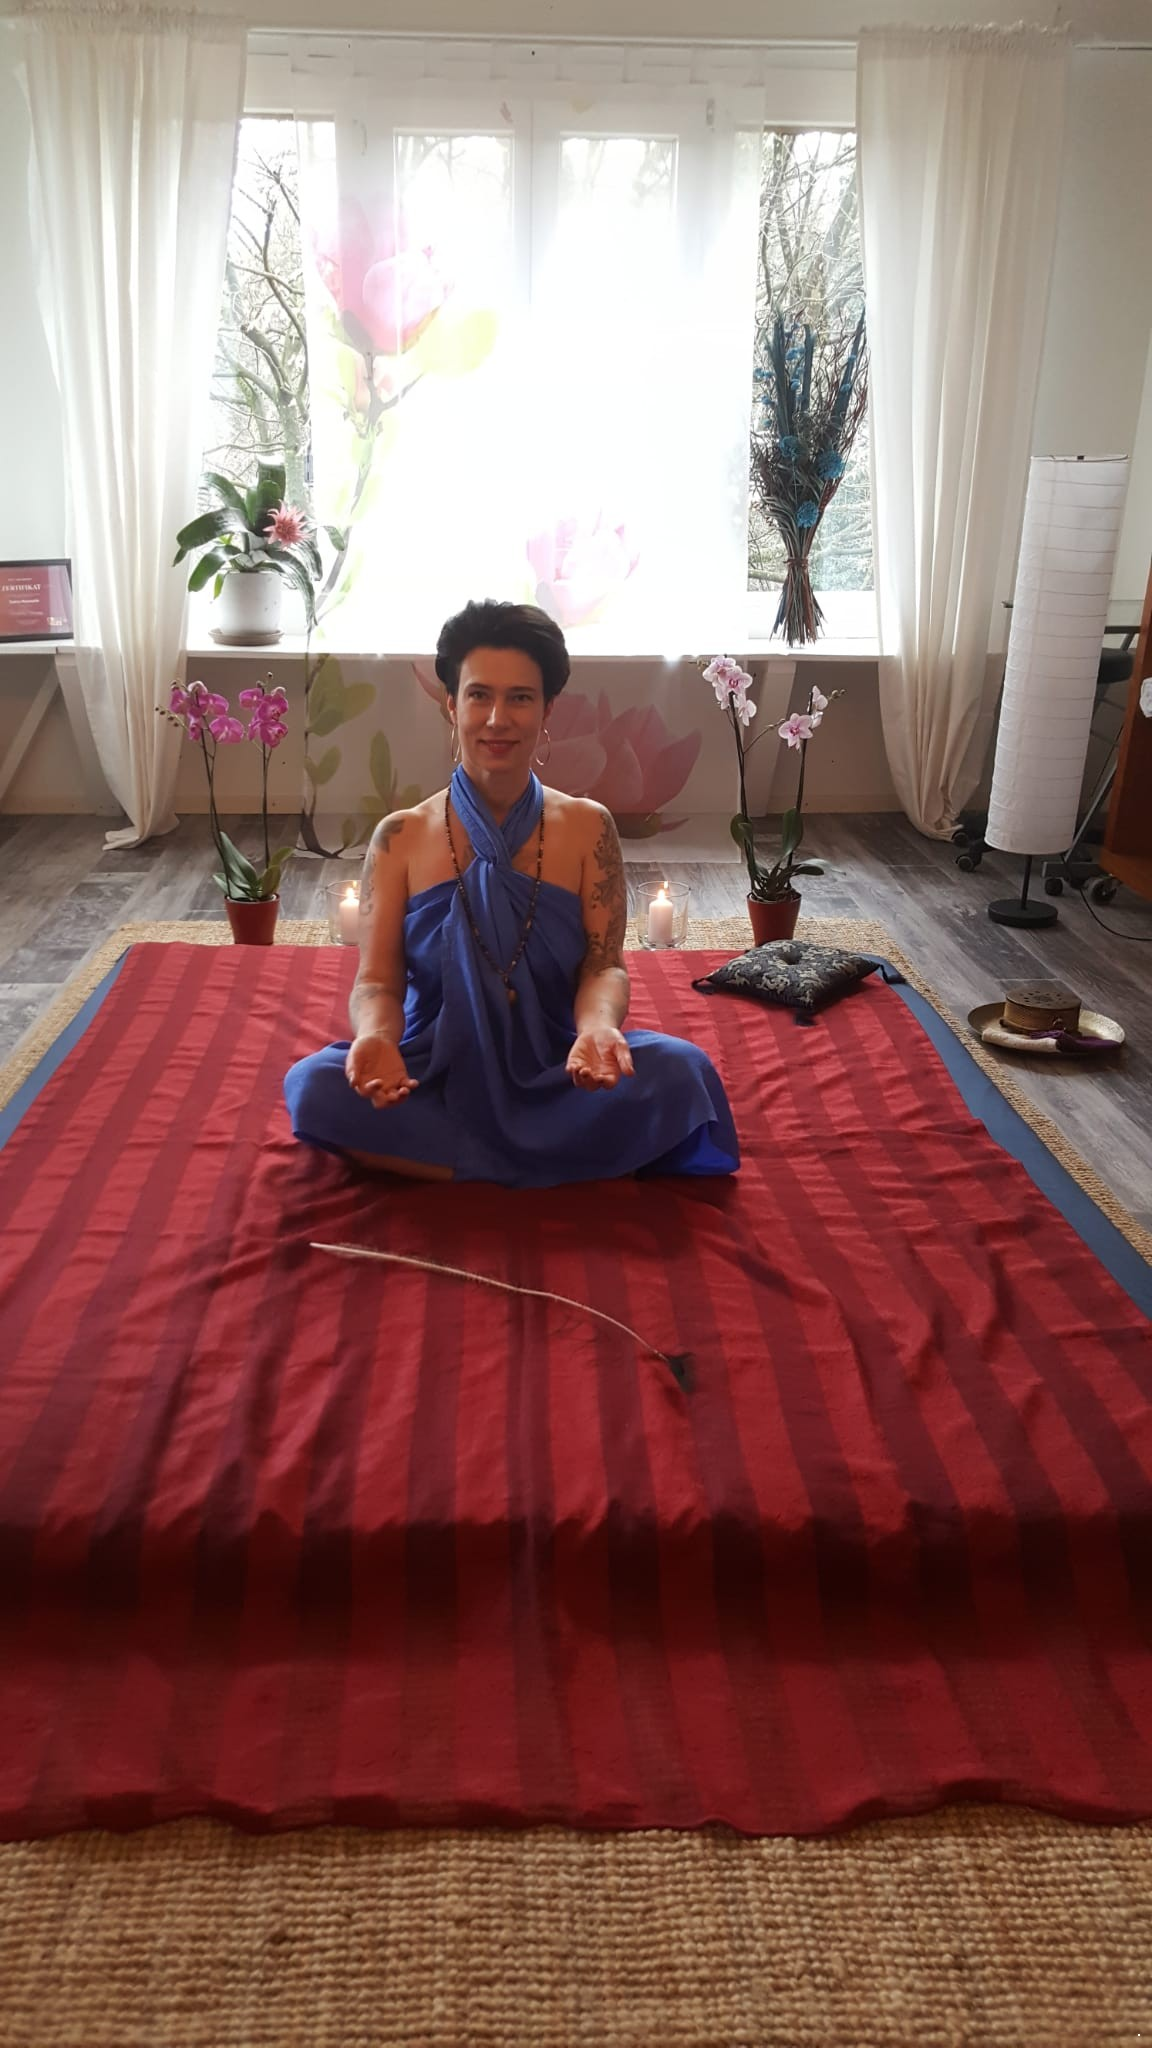 Erotik inserate Tantra - Erholen, Entspannen